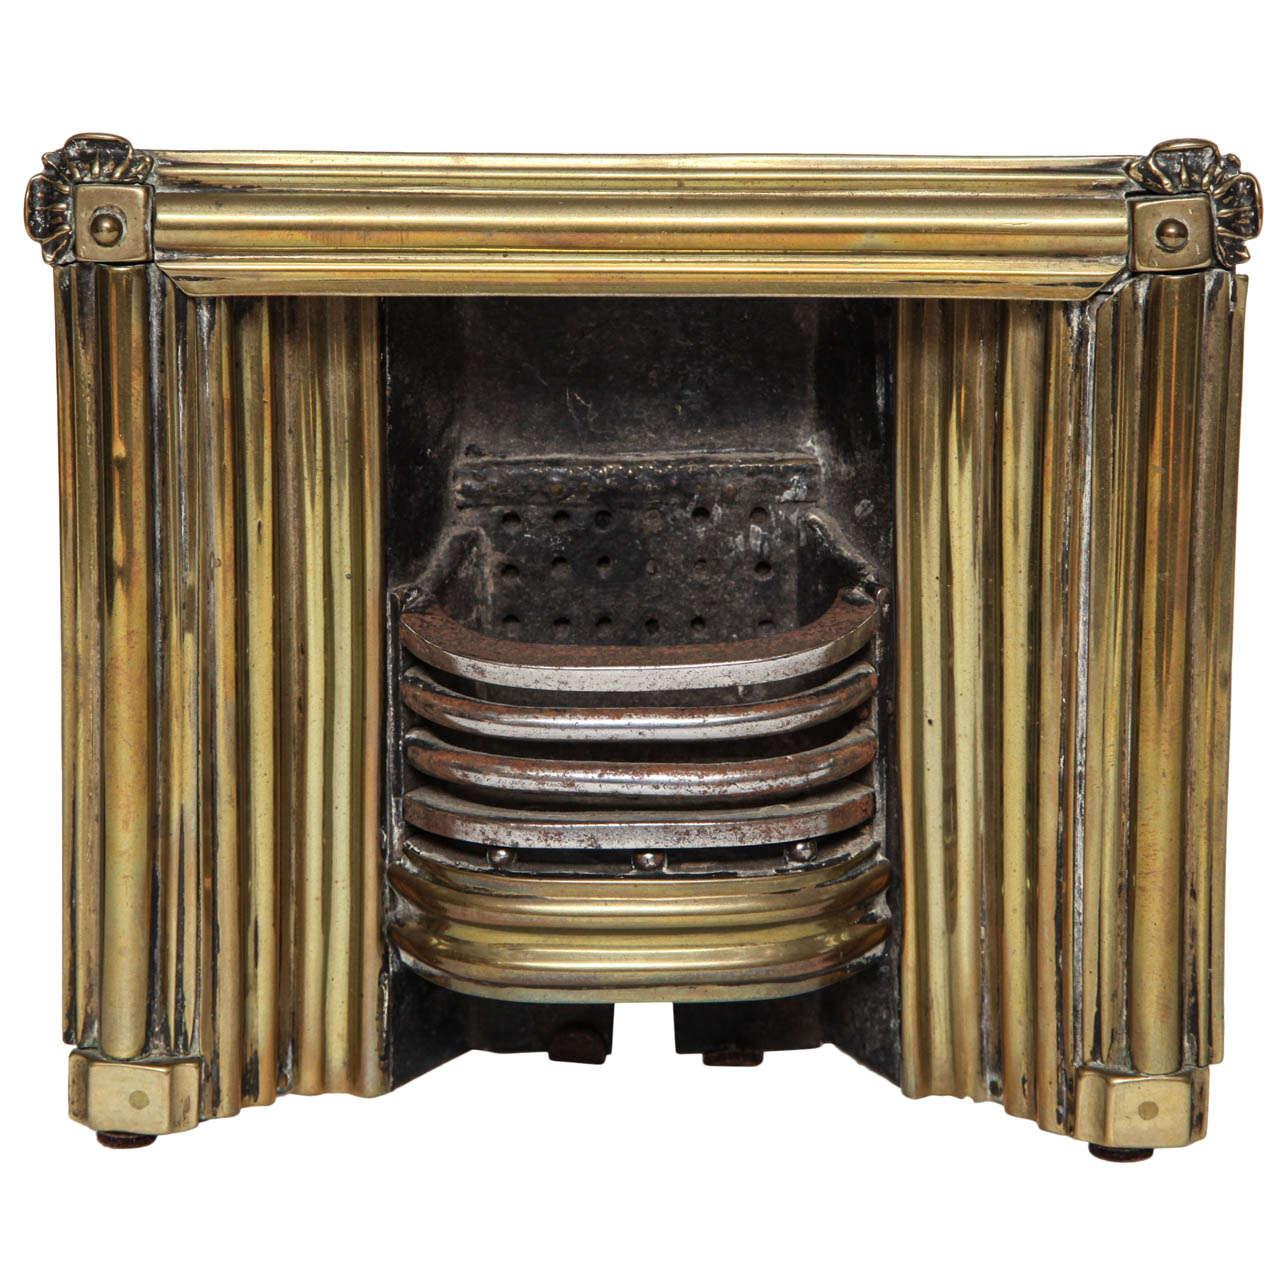 19th Century Miniature Fire Grate